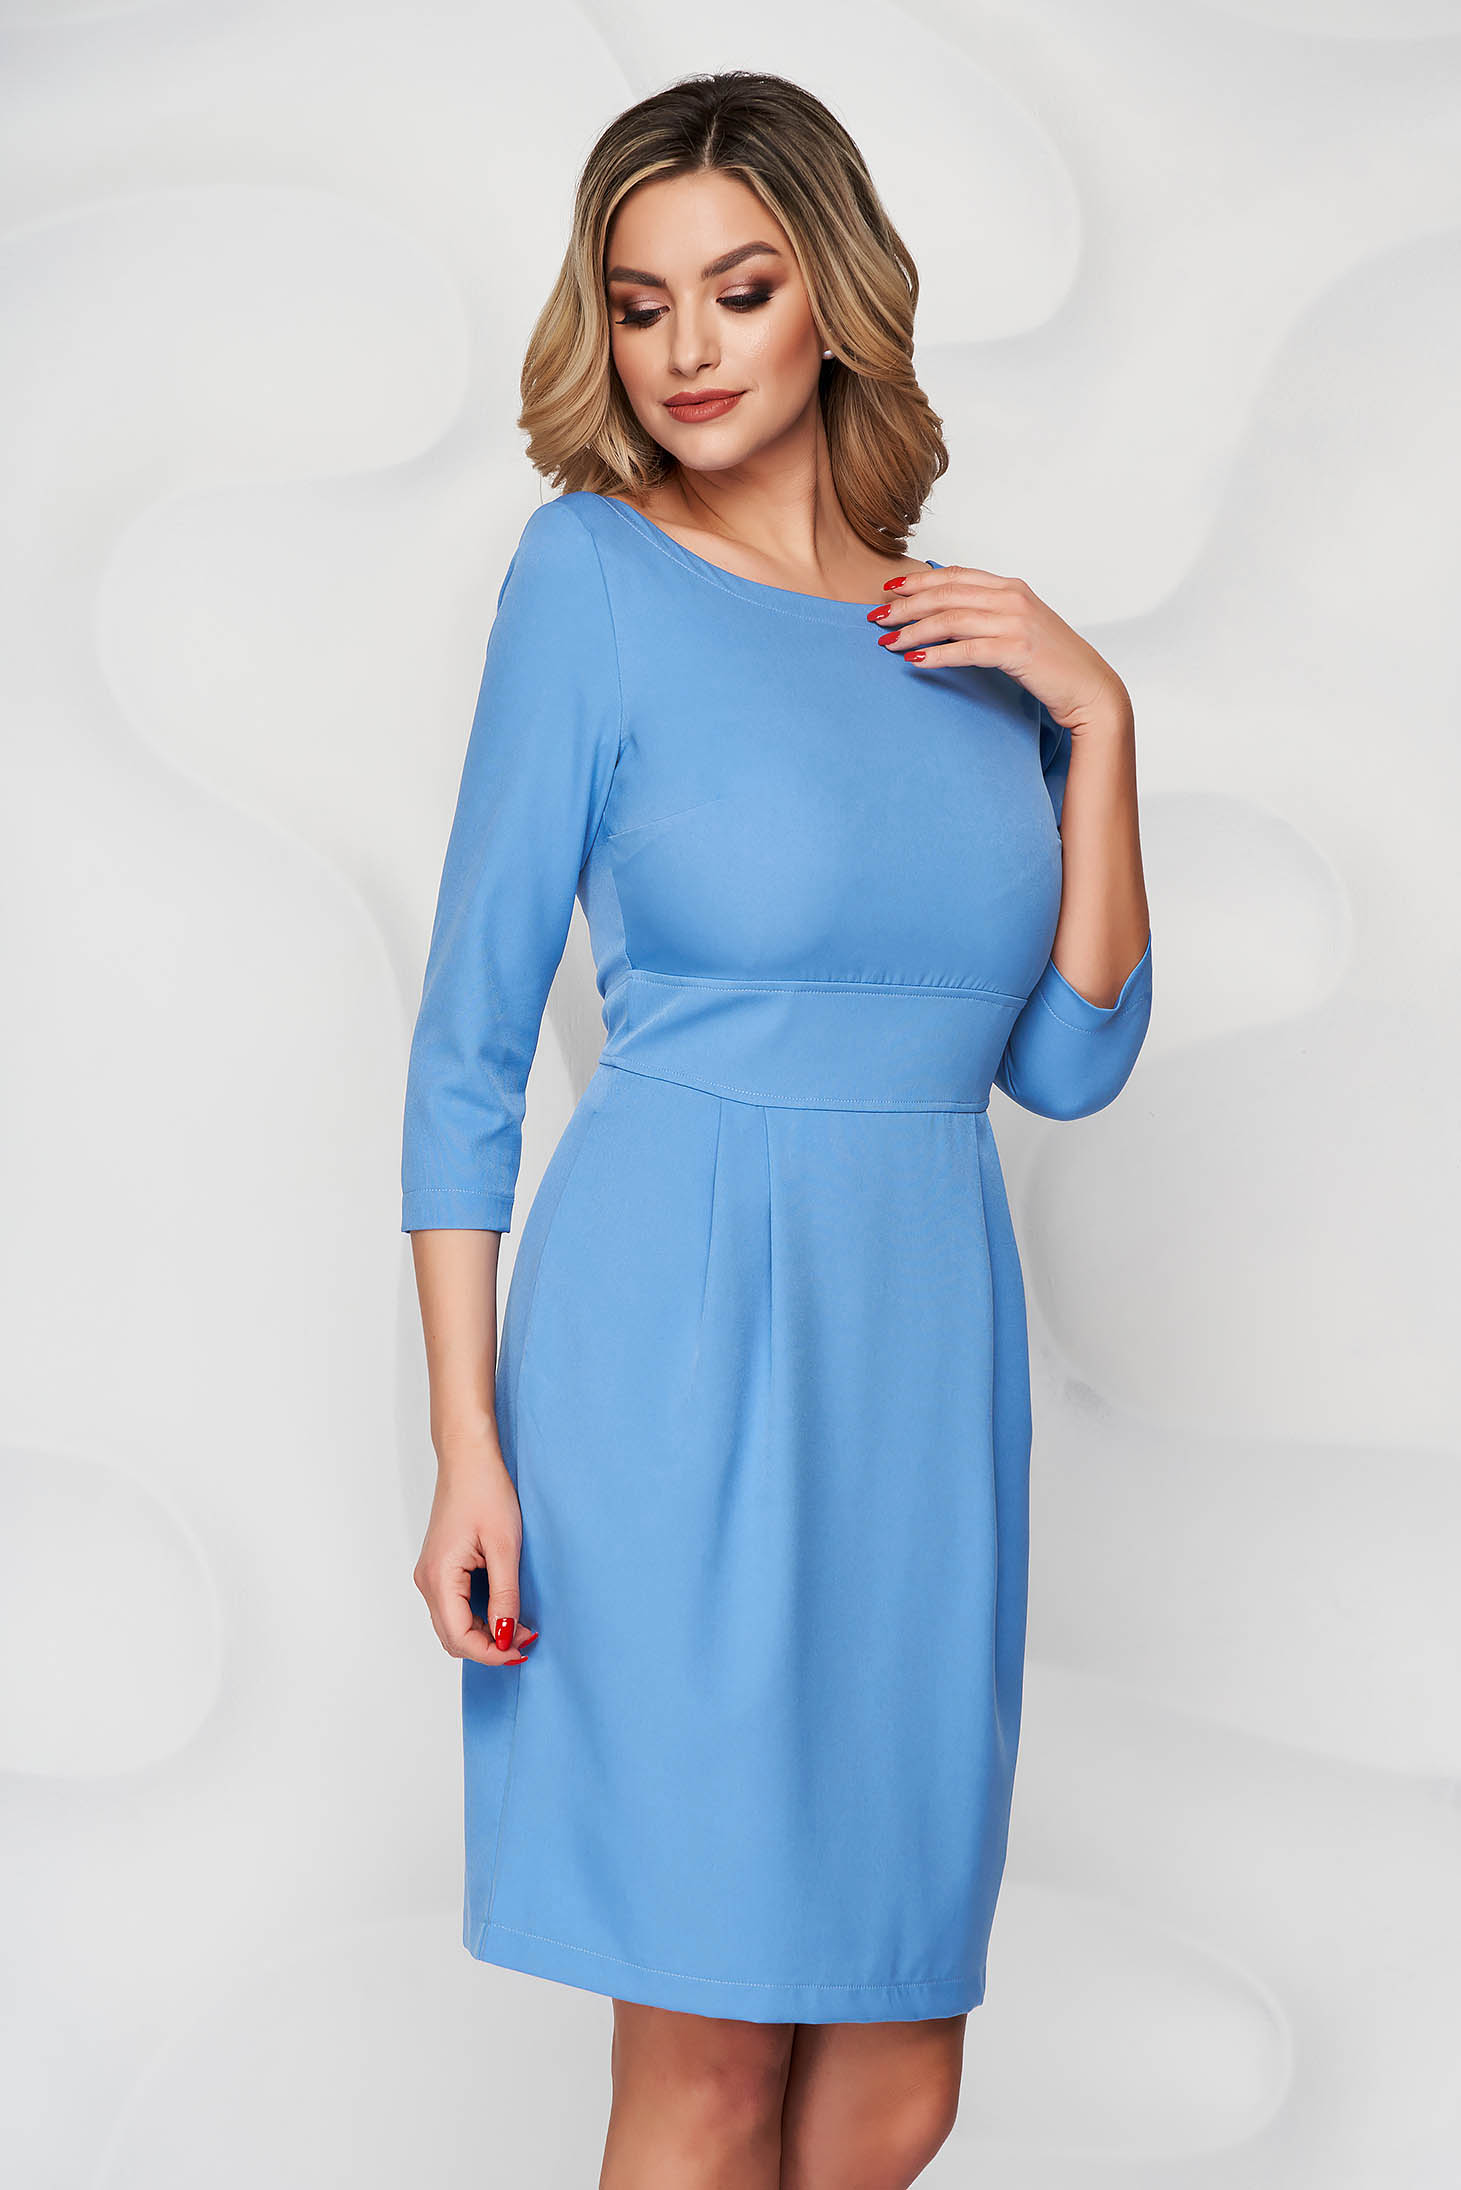 Rochie StarShinerS albastra scurta din stofa usor elastica cu croi in a si buzunare